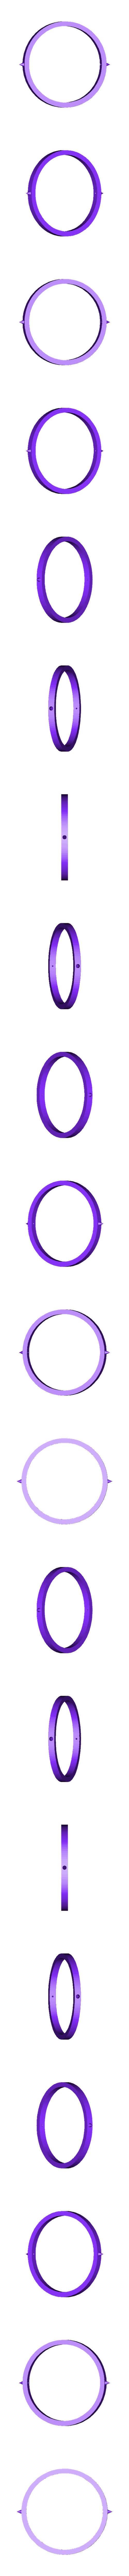 middle-ring.stl Download free STL file Steampunk Oculus Roboticus • 3D print design, cyrusharding